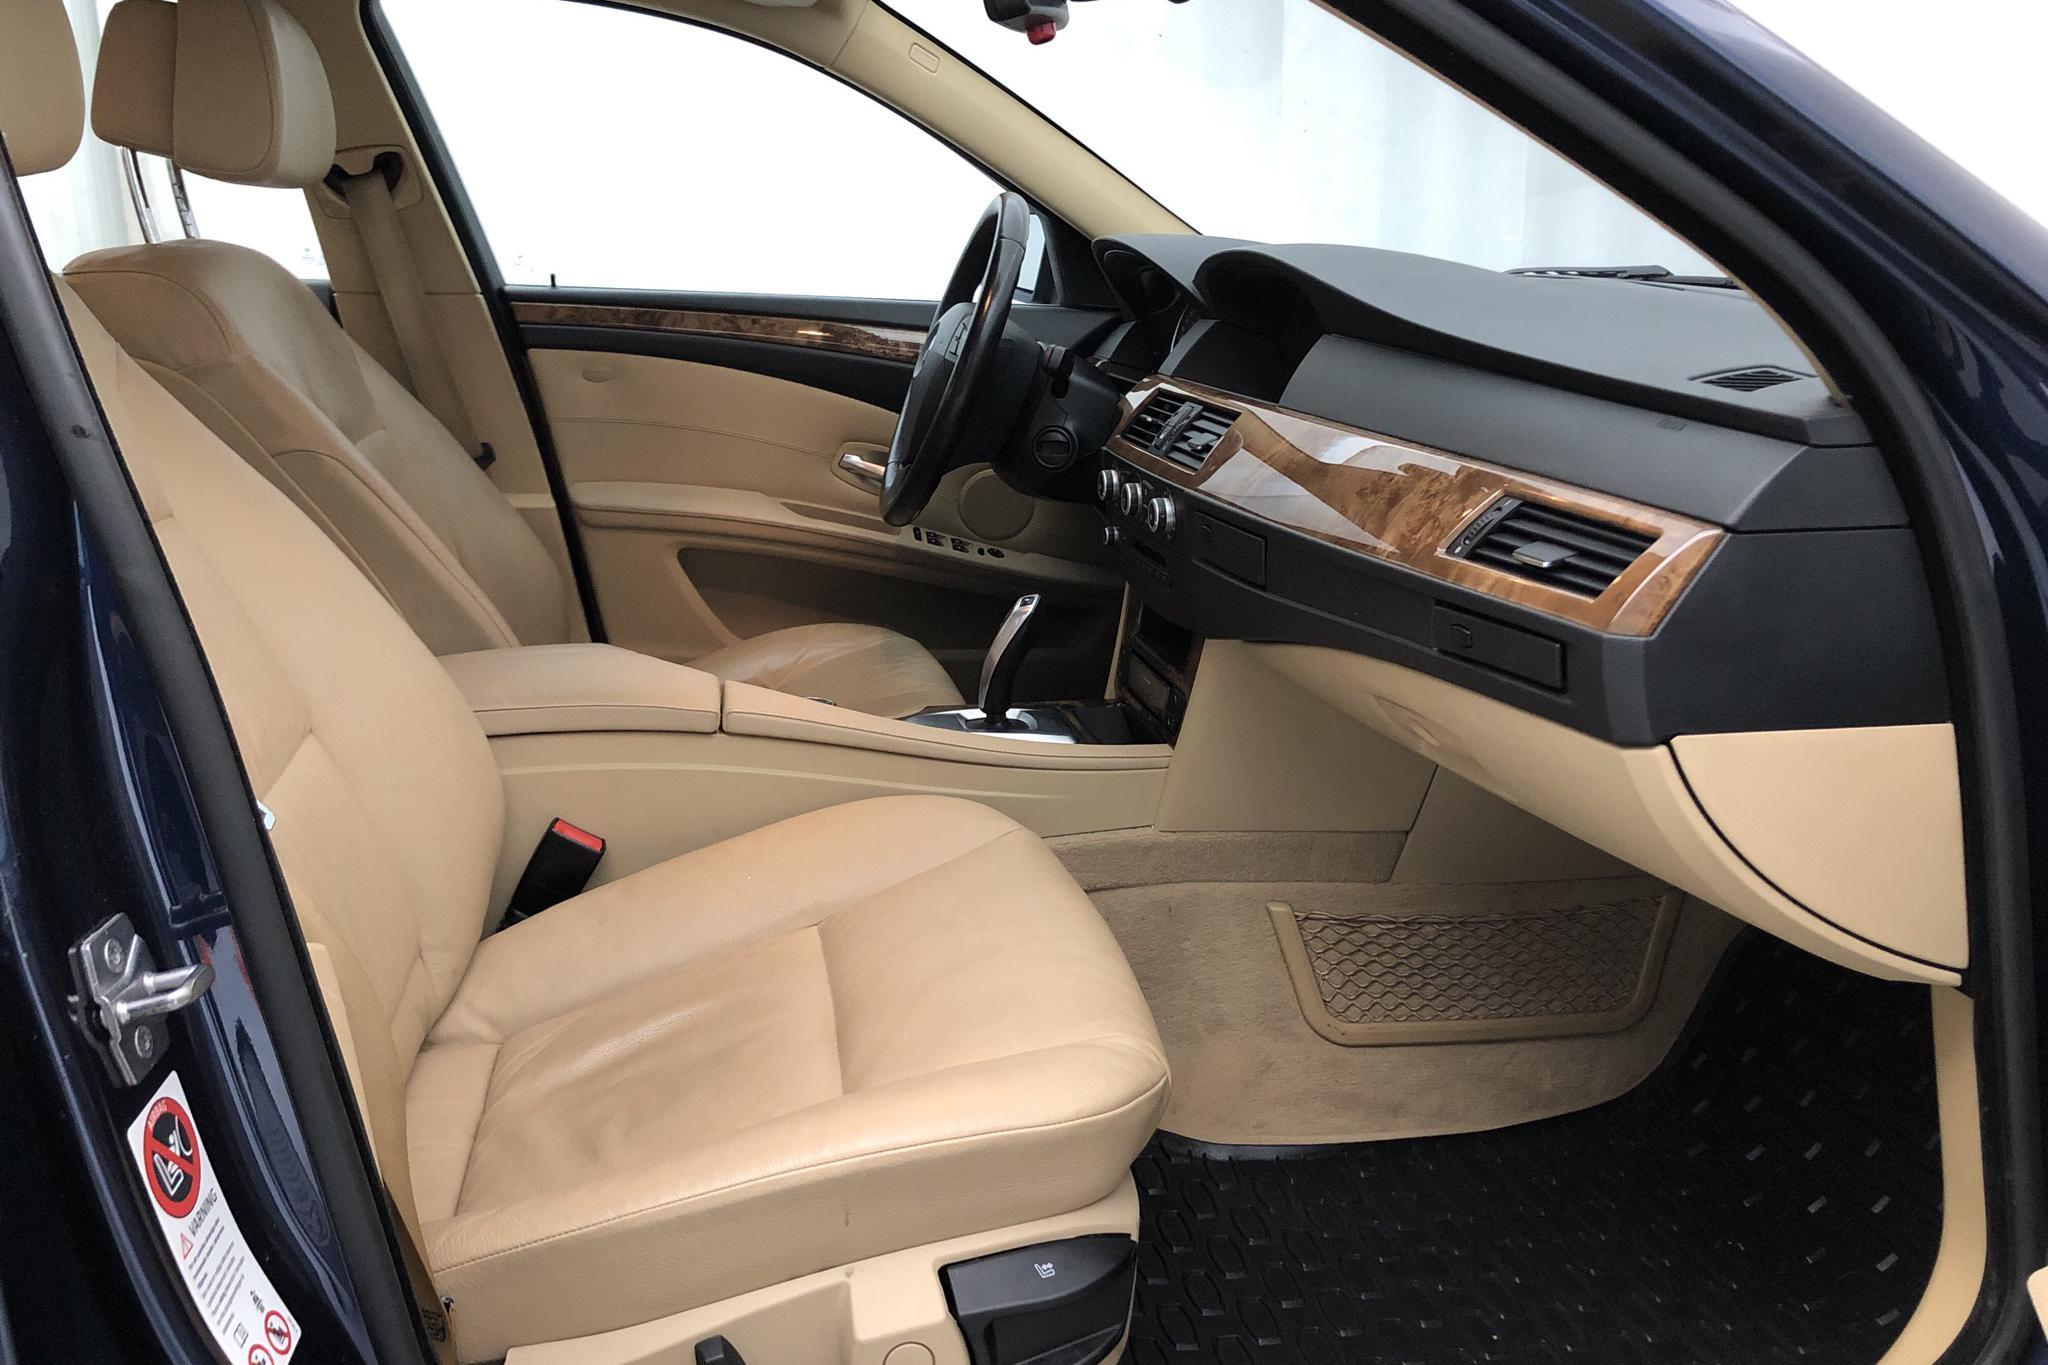 BMW 520d Sedan, E60 (177hk) - 93 480 km - Automatic - blue - 2009